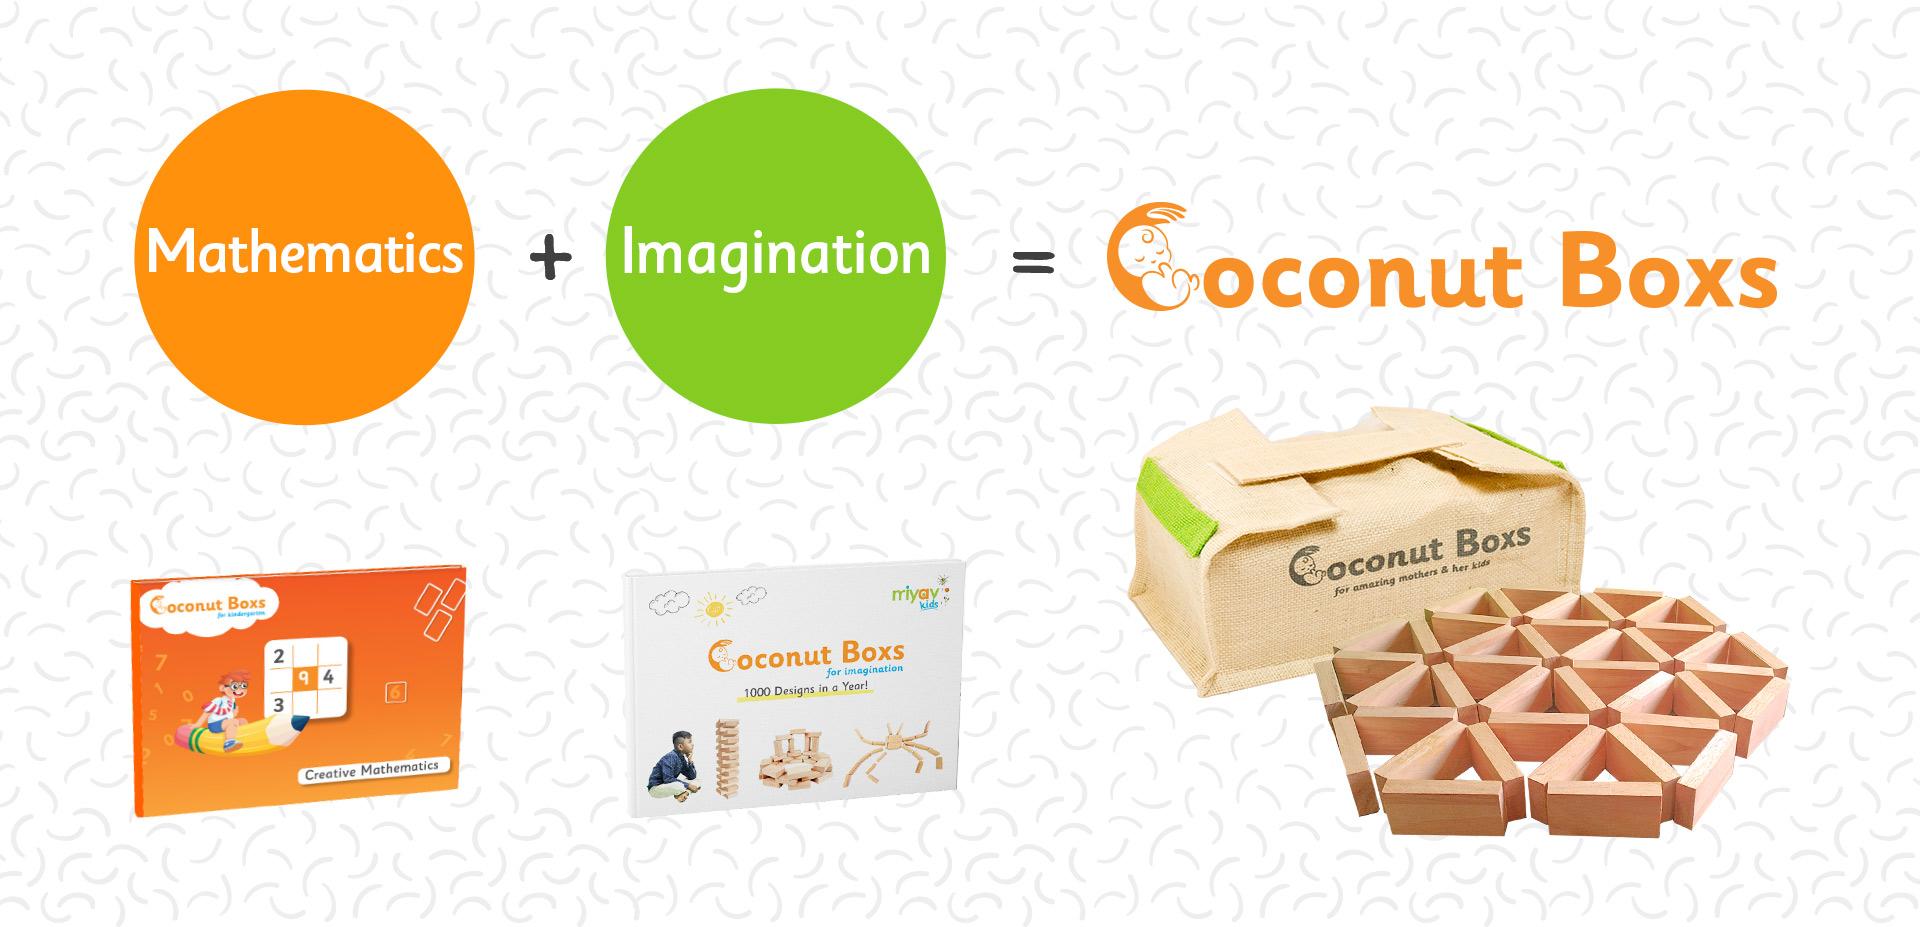 Coconutboxs_imagination-and-mathematics03